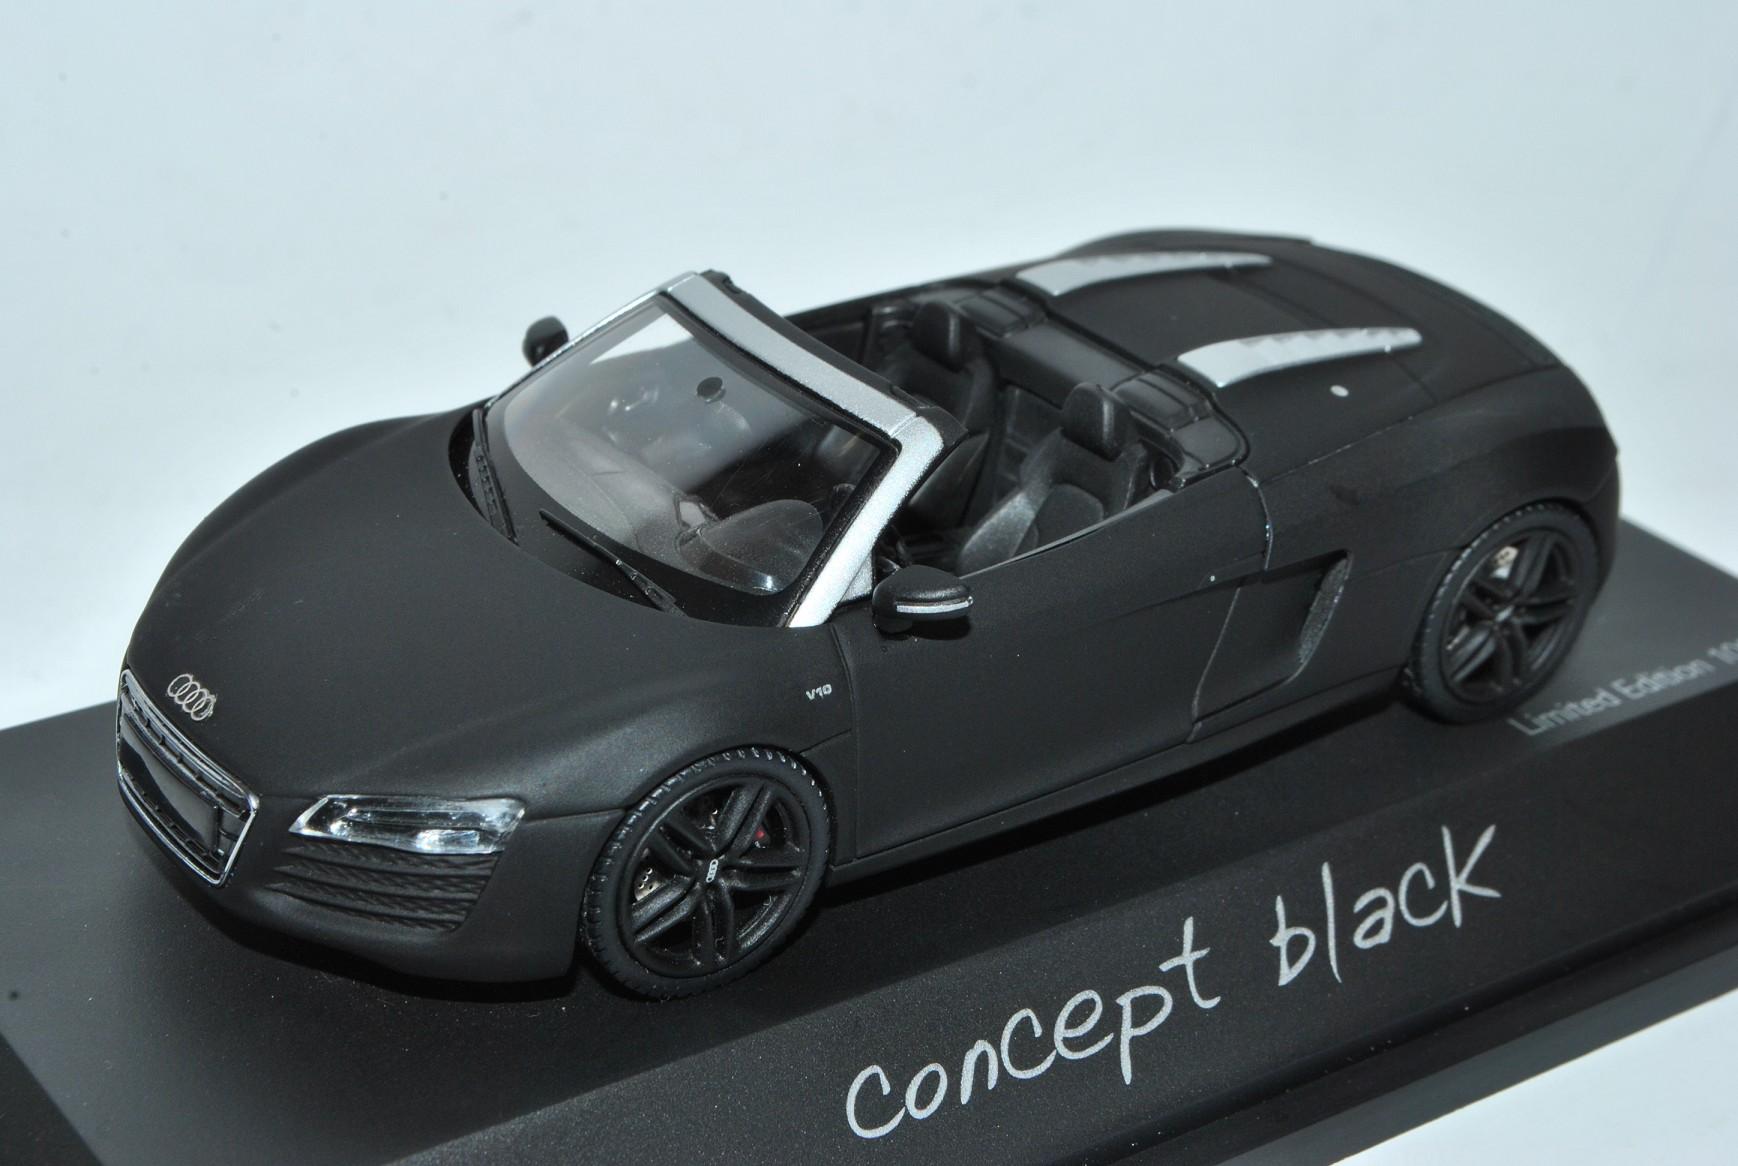 Audi R8 Cabrio Cabrio Cabrio Concept Matt Schwarz Facelift Ab 2012 1 43 Schuco Modell Auto m..  | Optimaler Preis  76774d